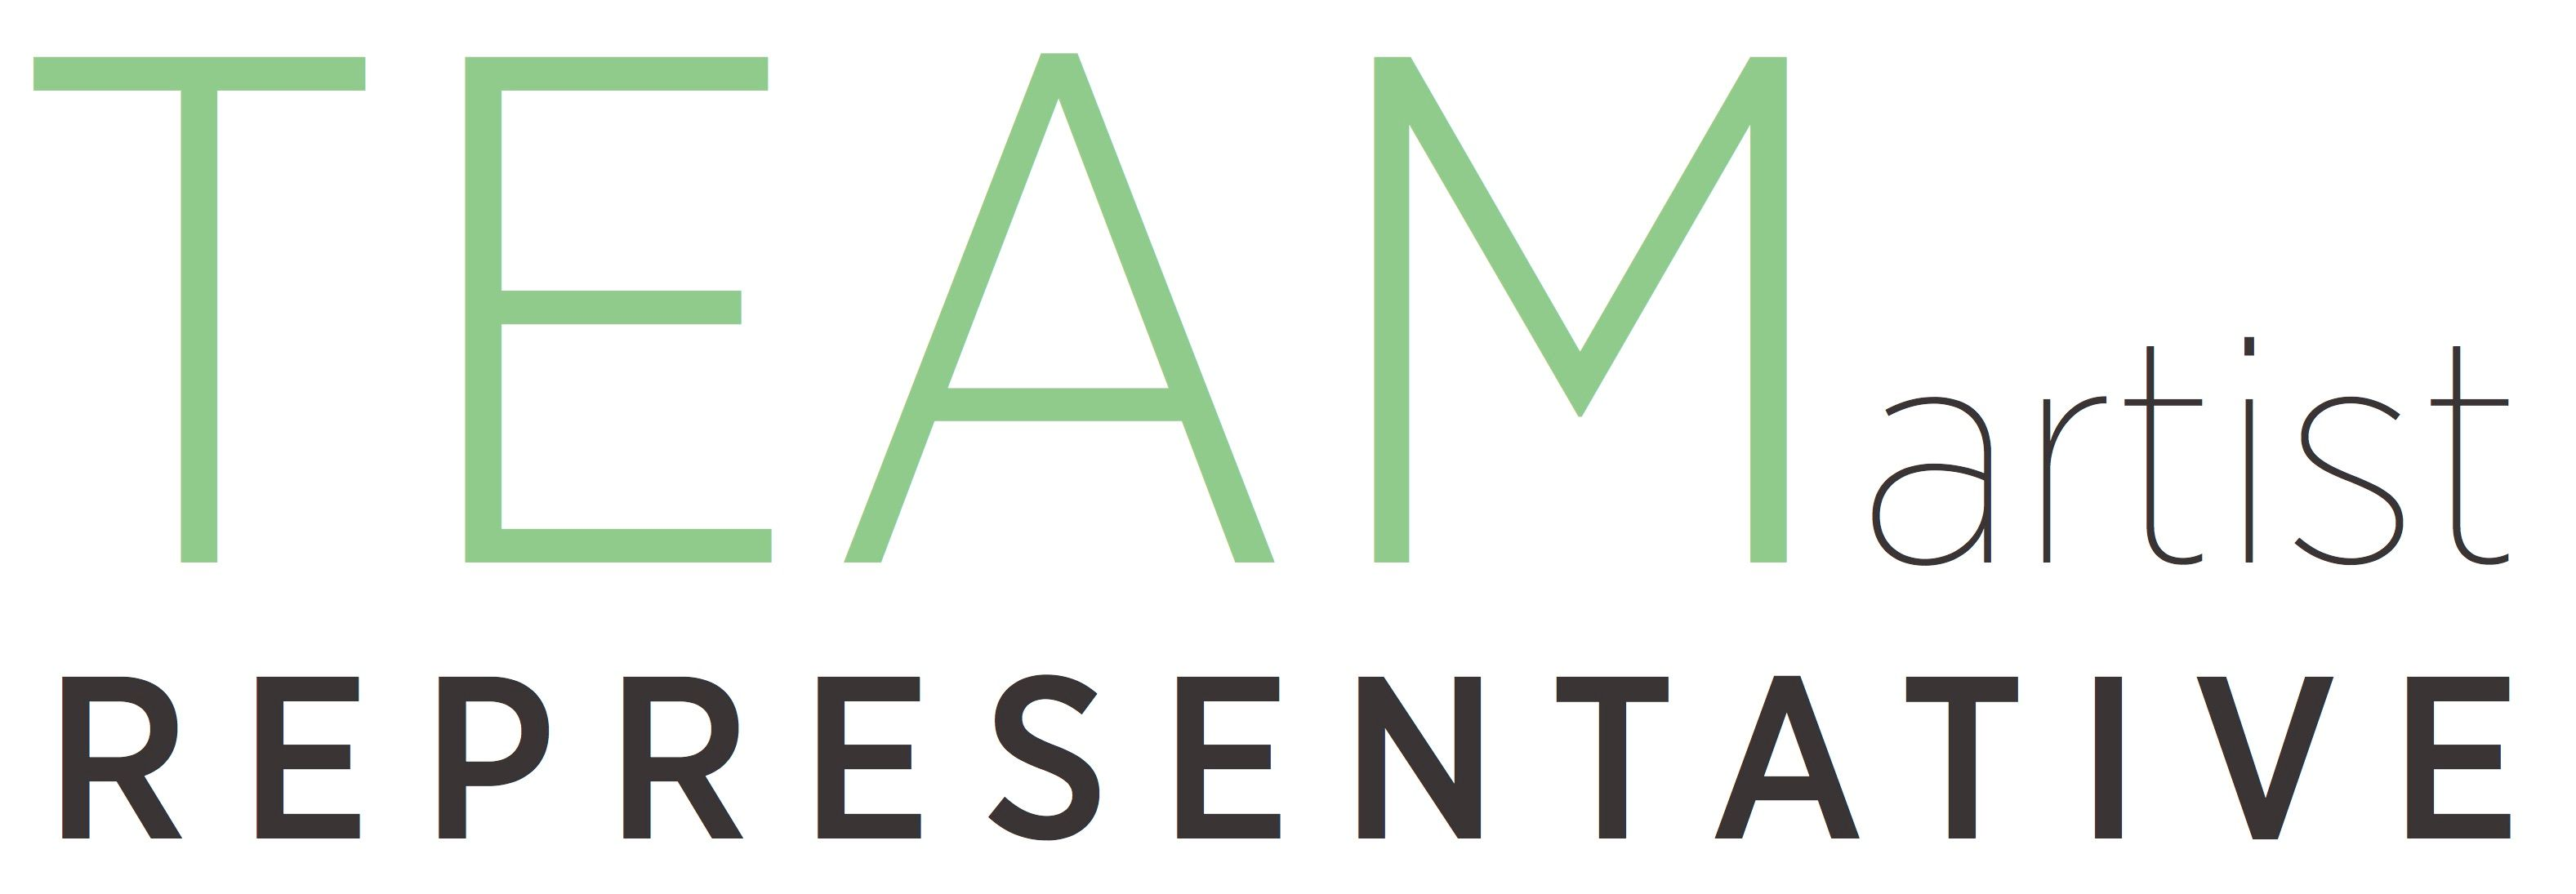 team artist representative